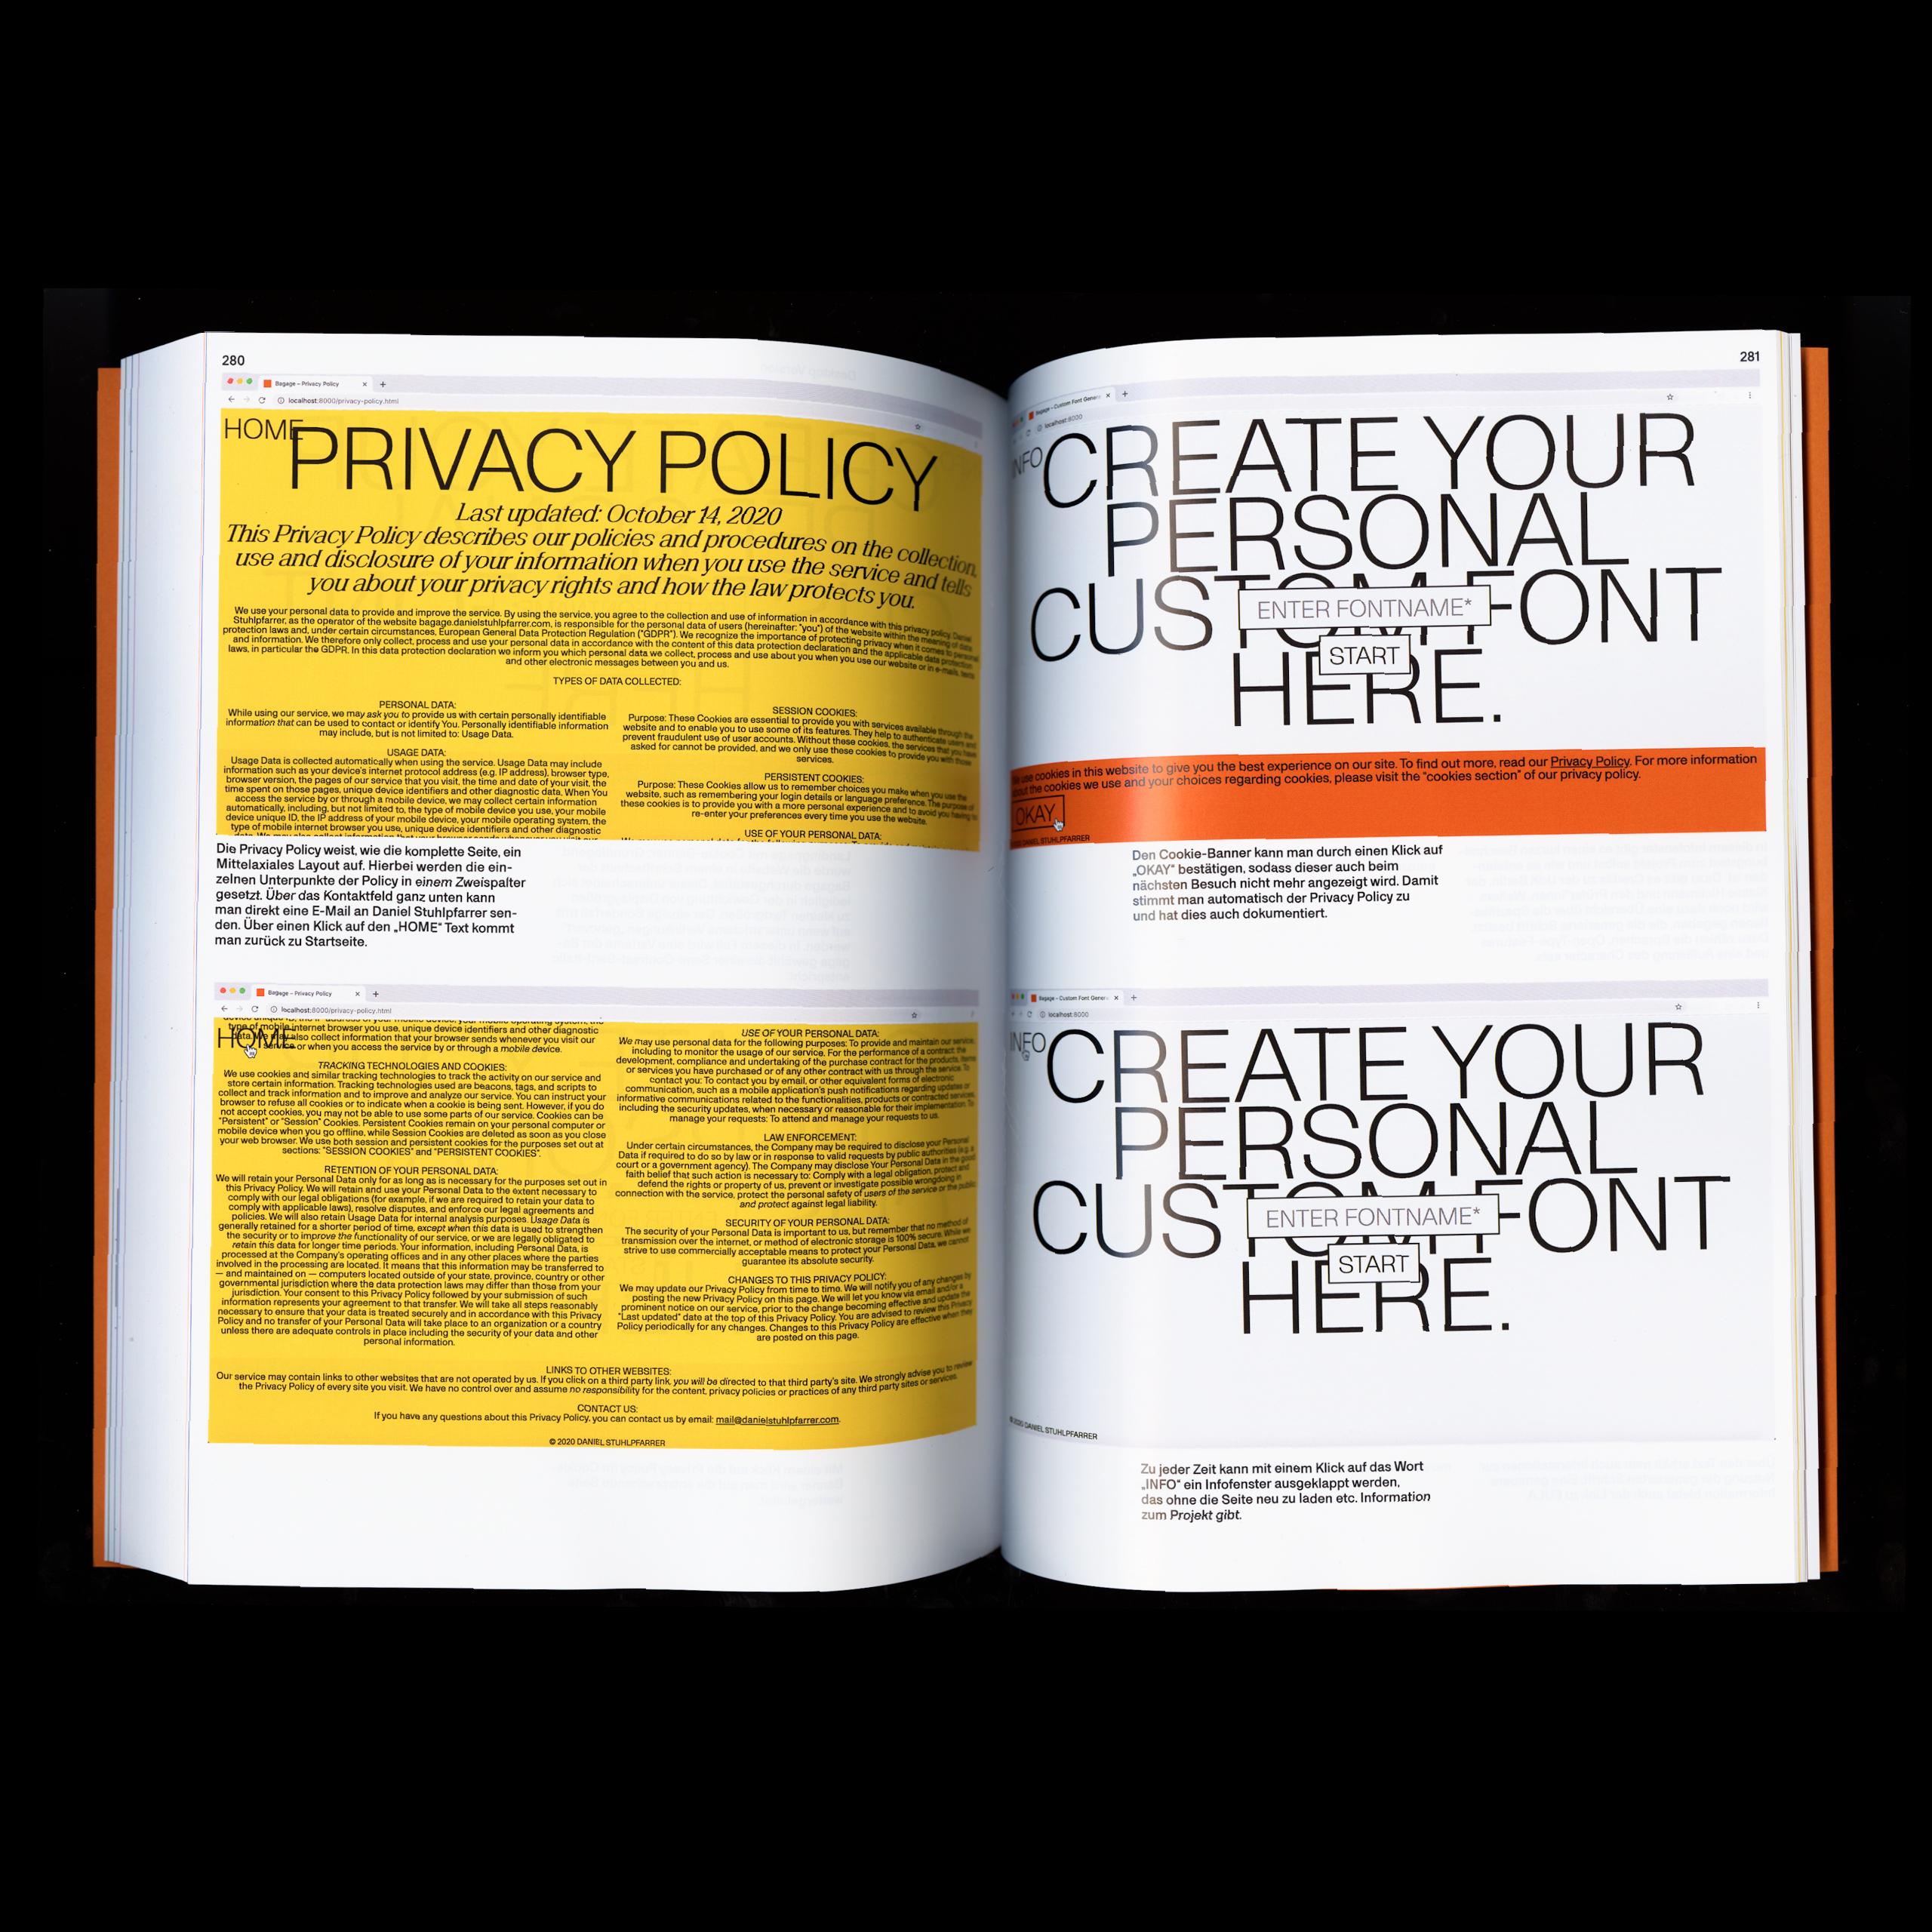 Daniel_Stuhlpfarrer_Spekulative-Schriftgestaltung-Speculative-Type-Design_WEB77